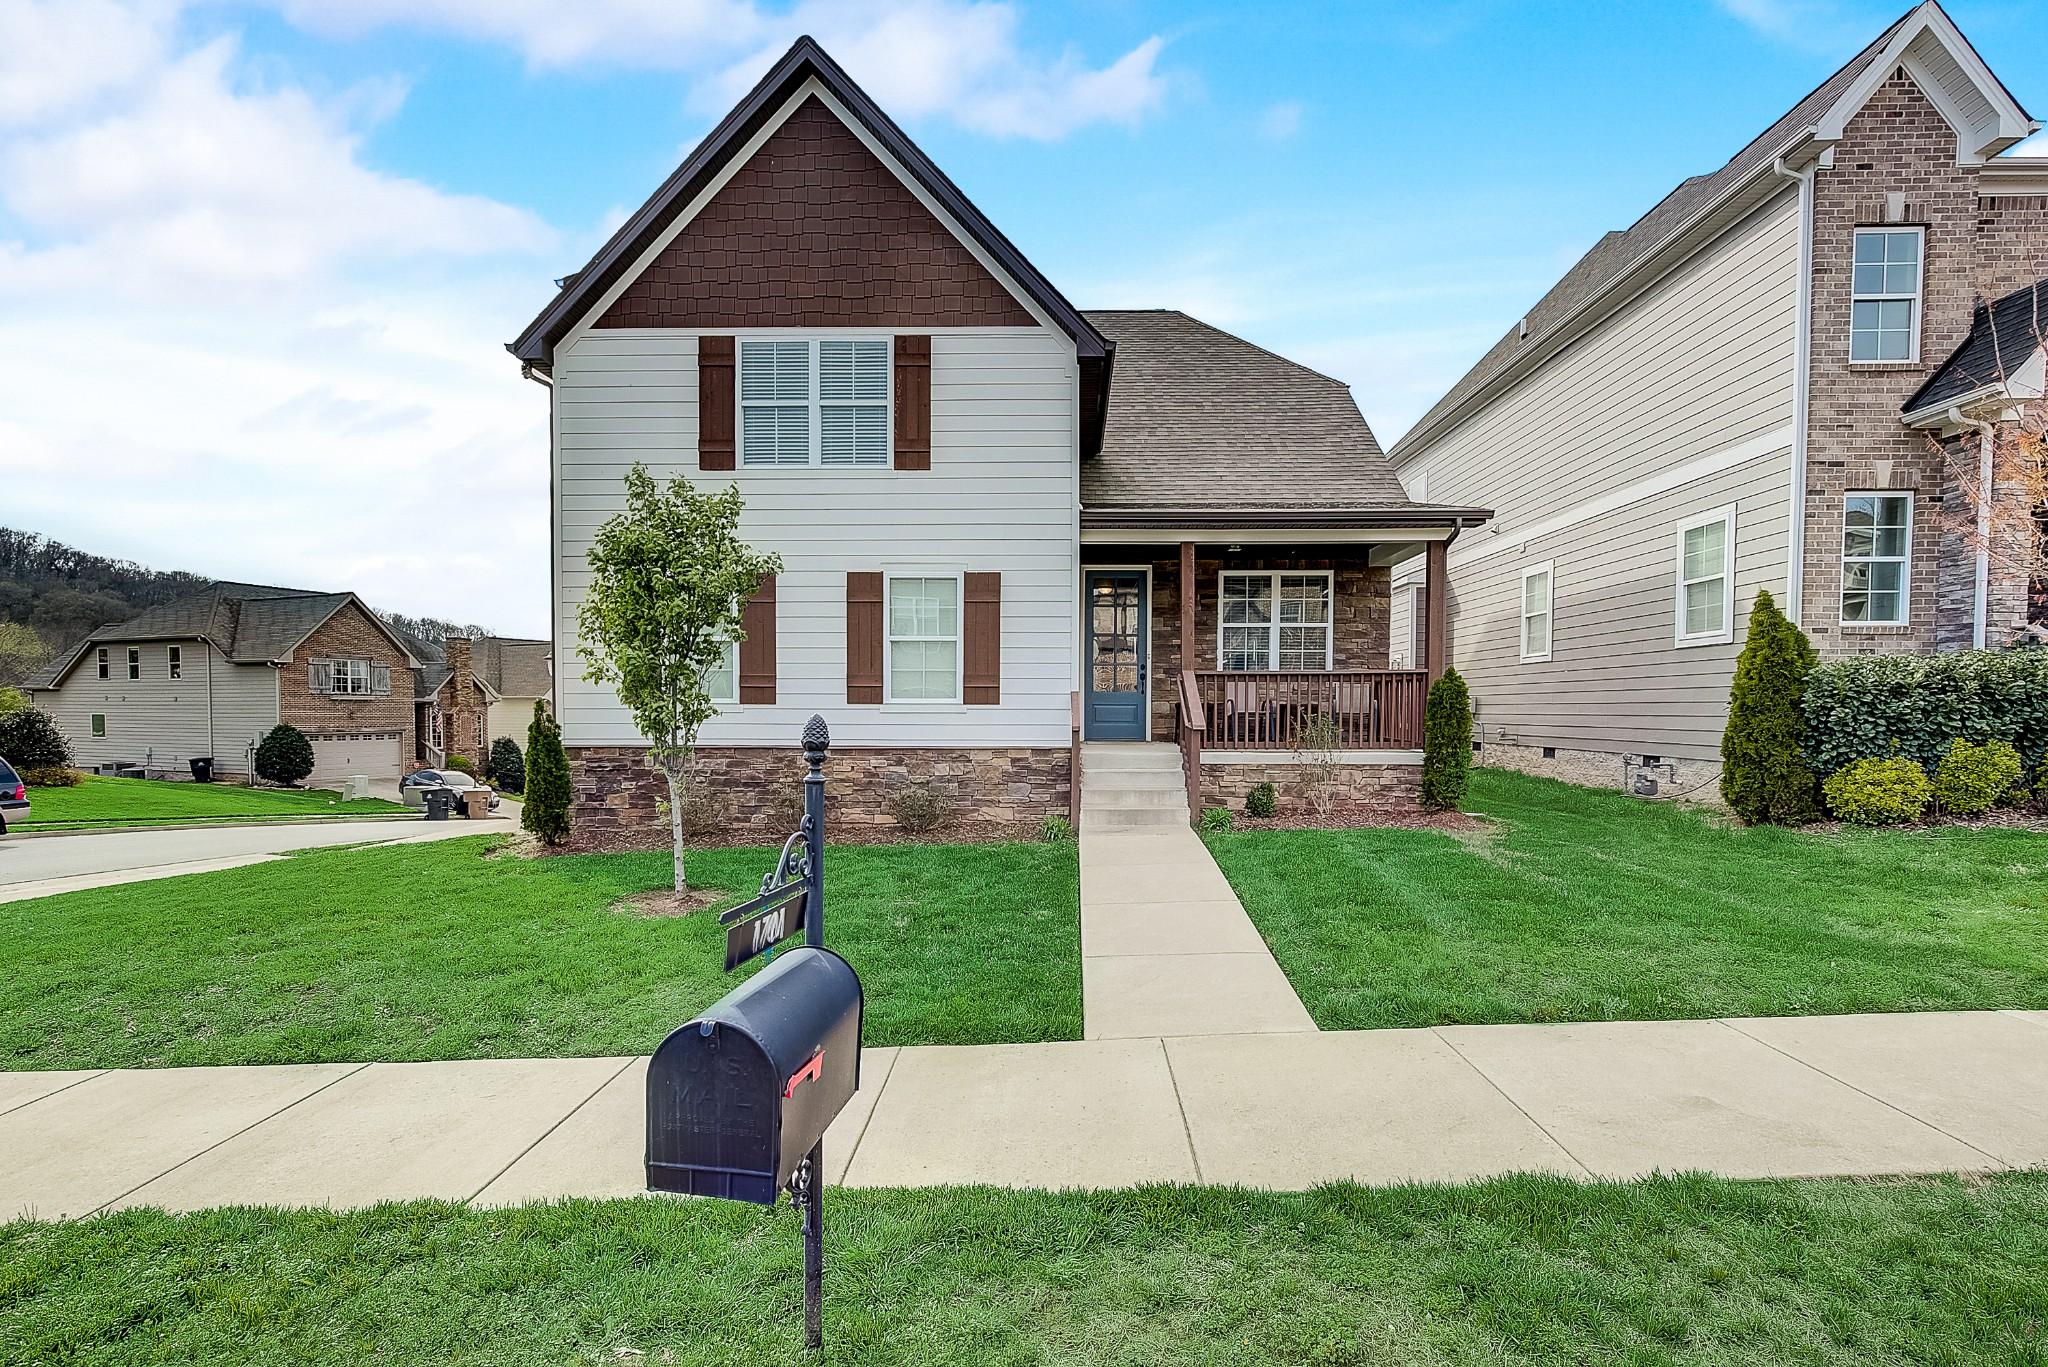 1701 Boxwood Dr, Nashville, TN 37211 - Nashville, TN real estate listing